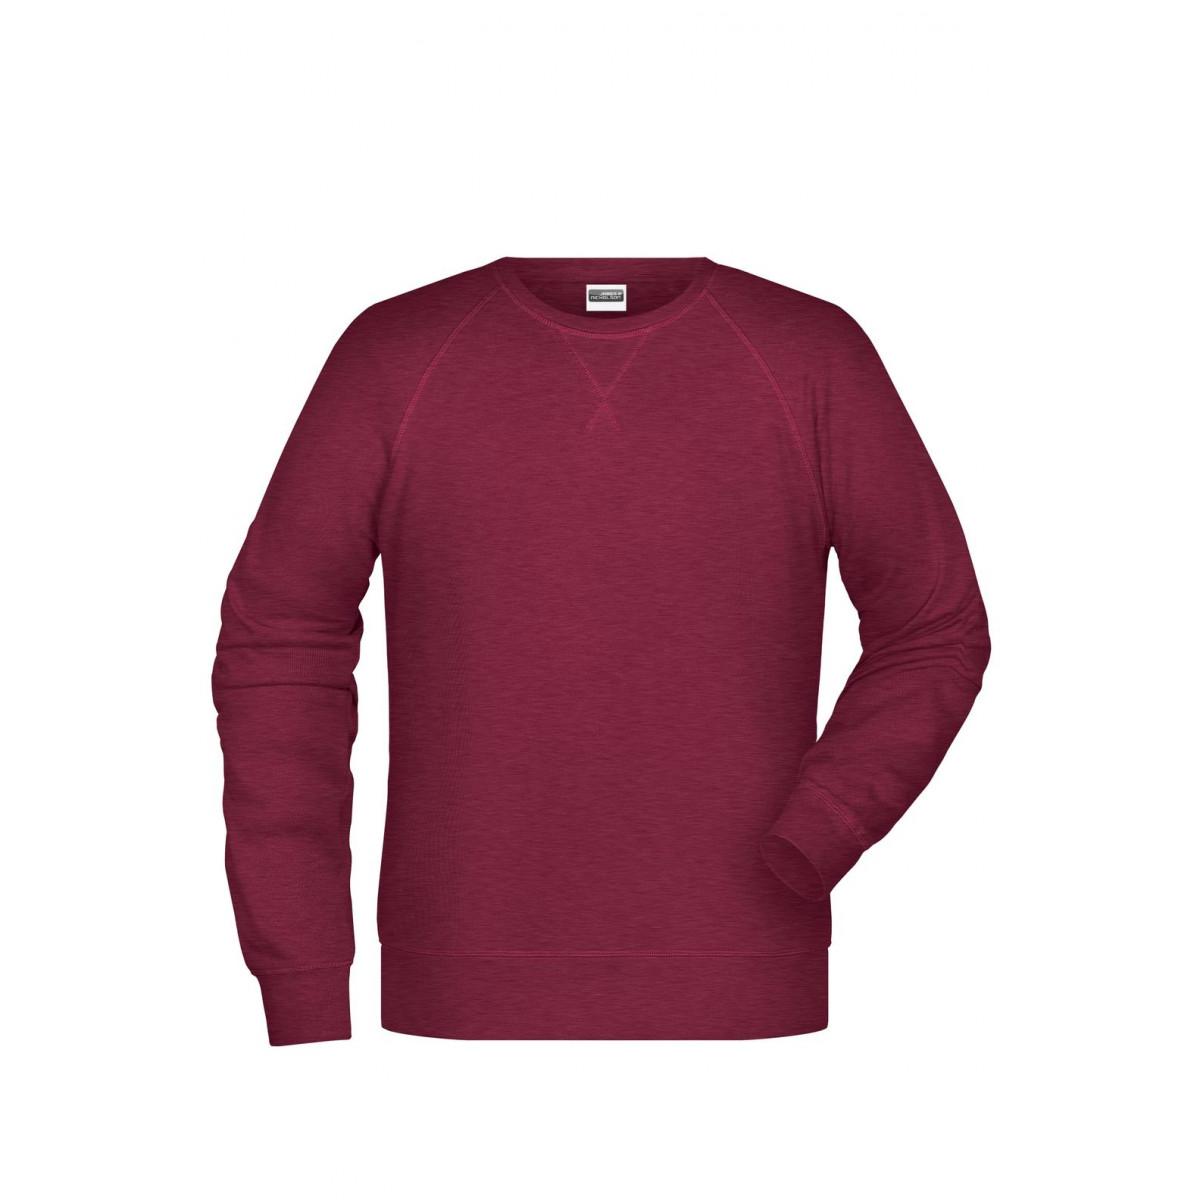 Толстовка мужская 8022 Men´s Sweat - Бордовый меланж